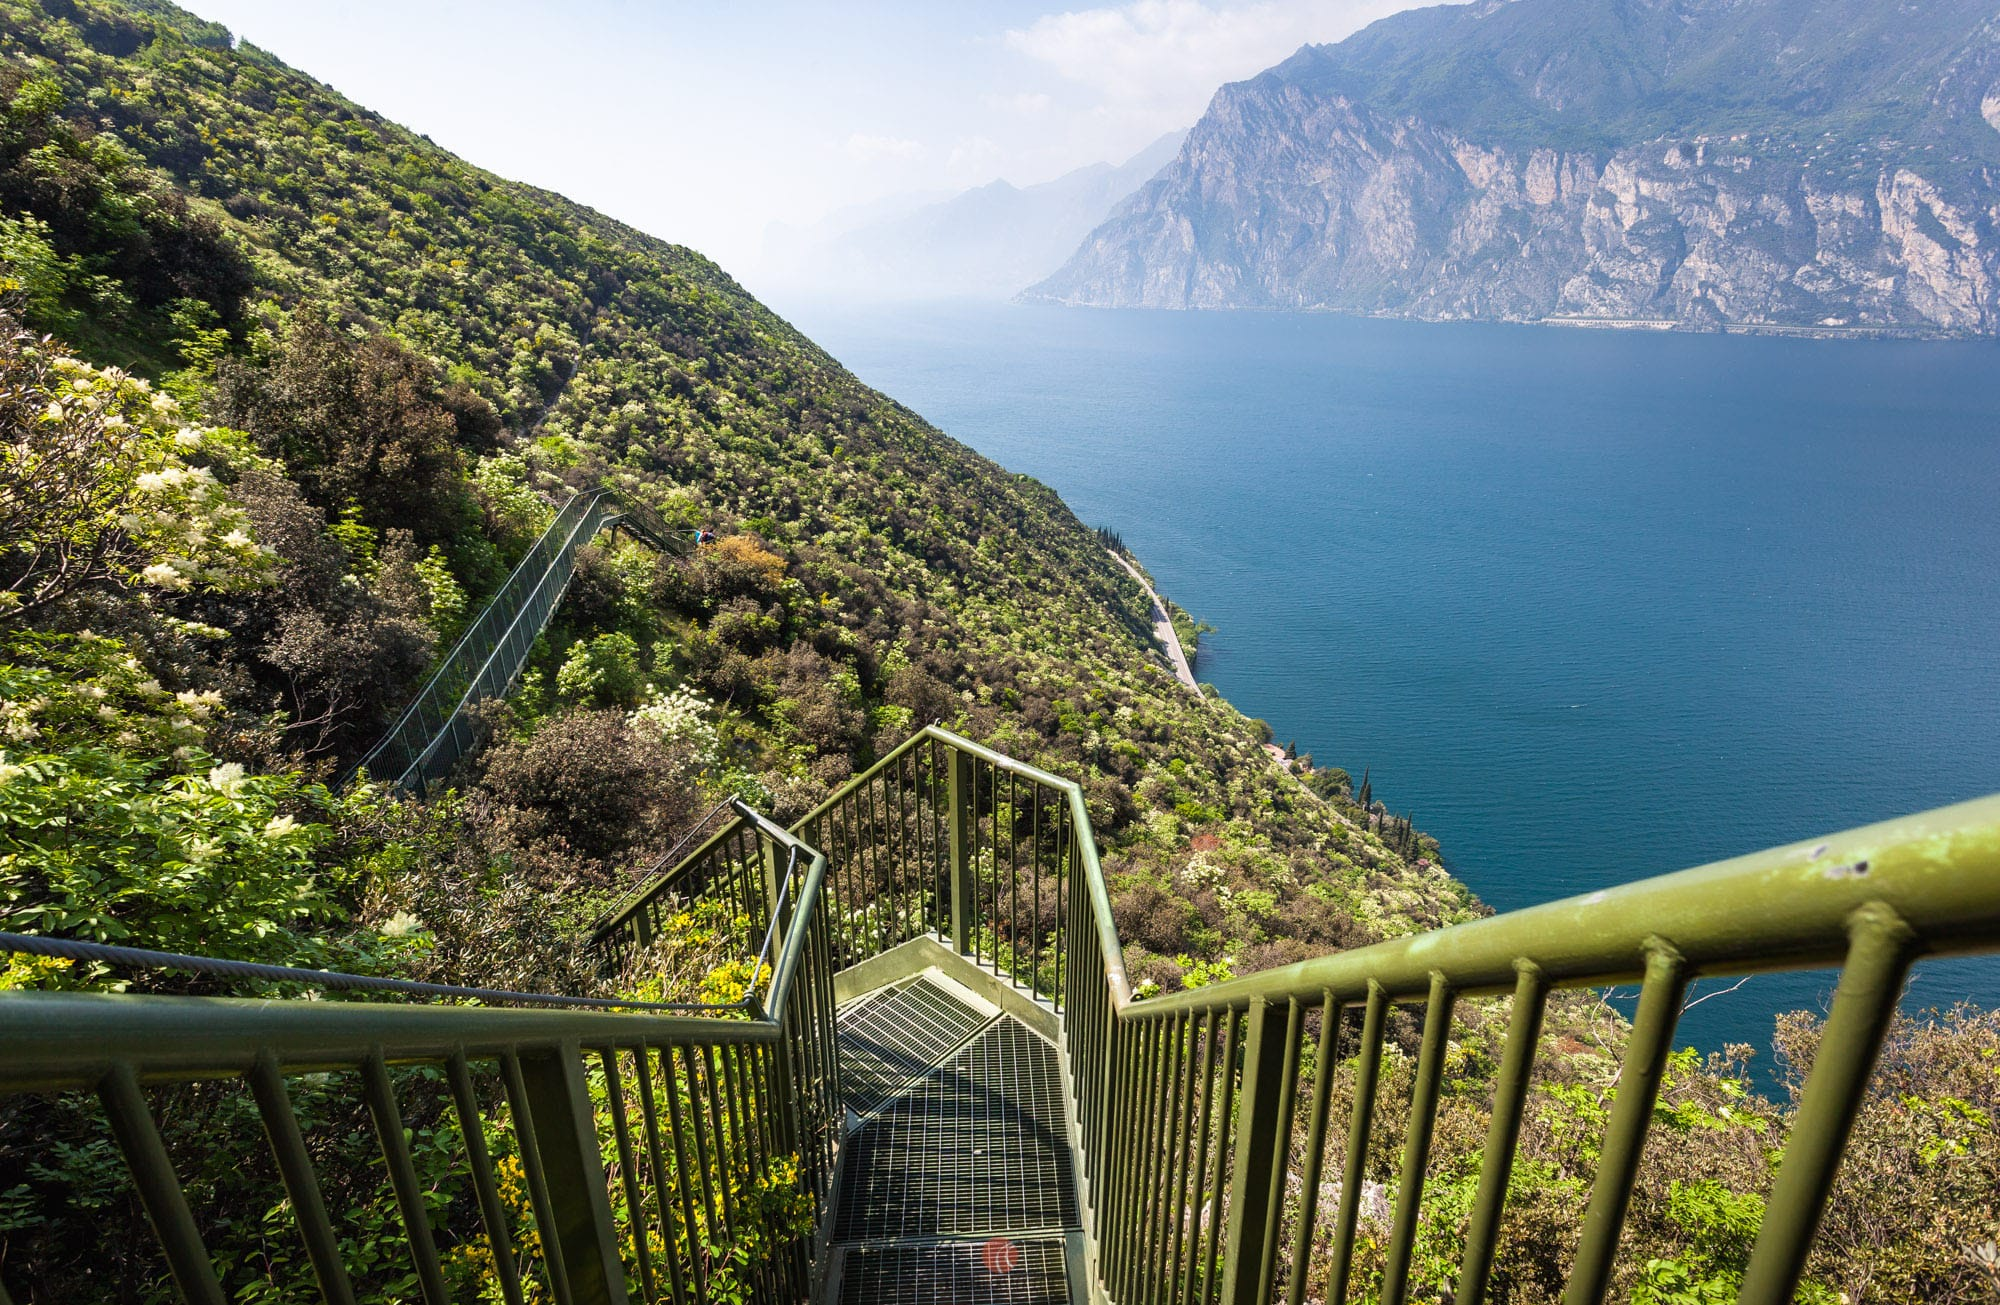 wanderwege gardasee karte Panoramaweg Busatte Tempesta – Wandern am Gardasee